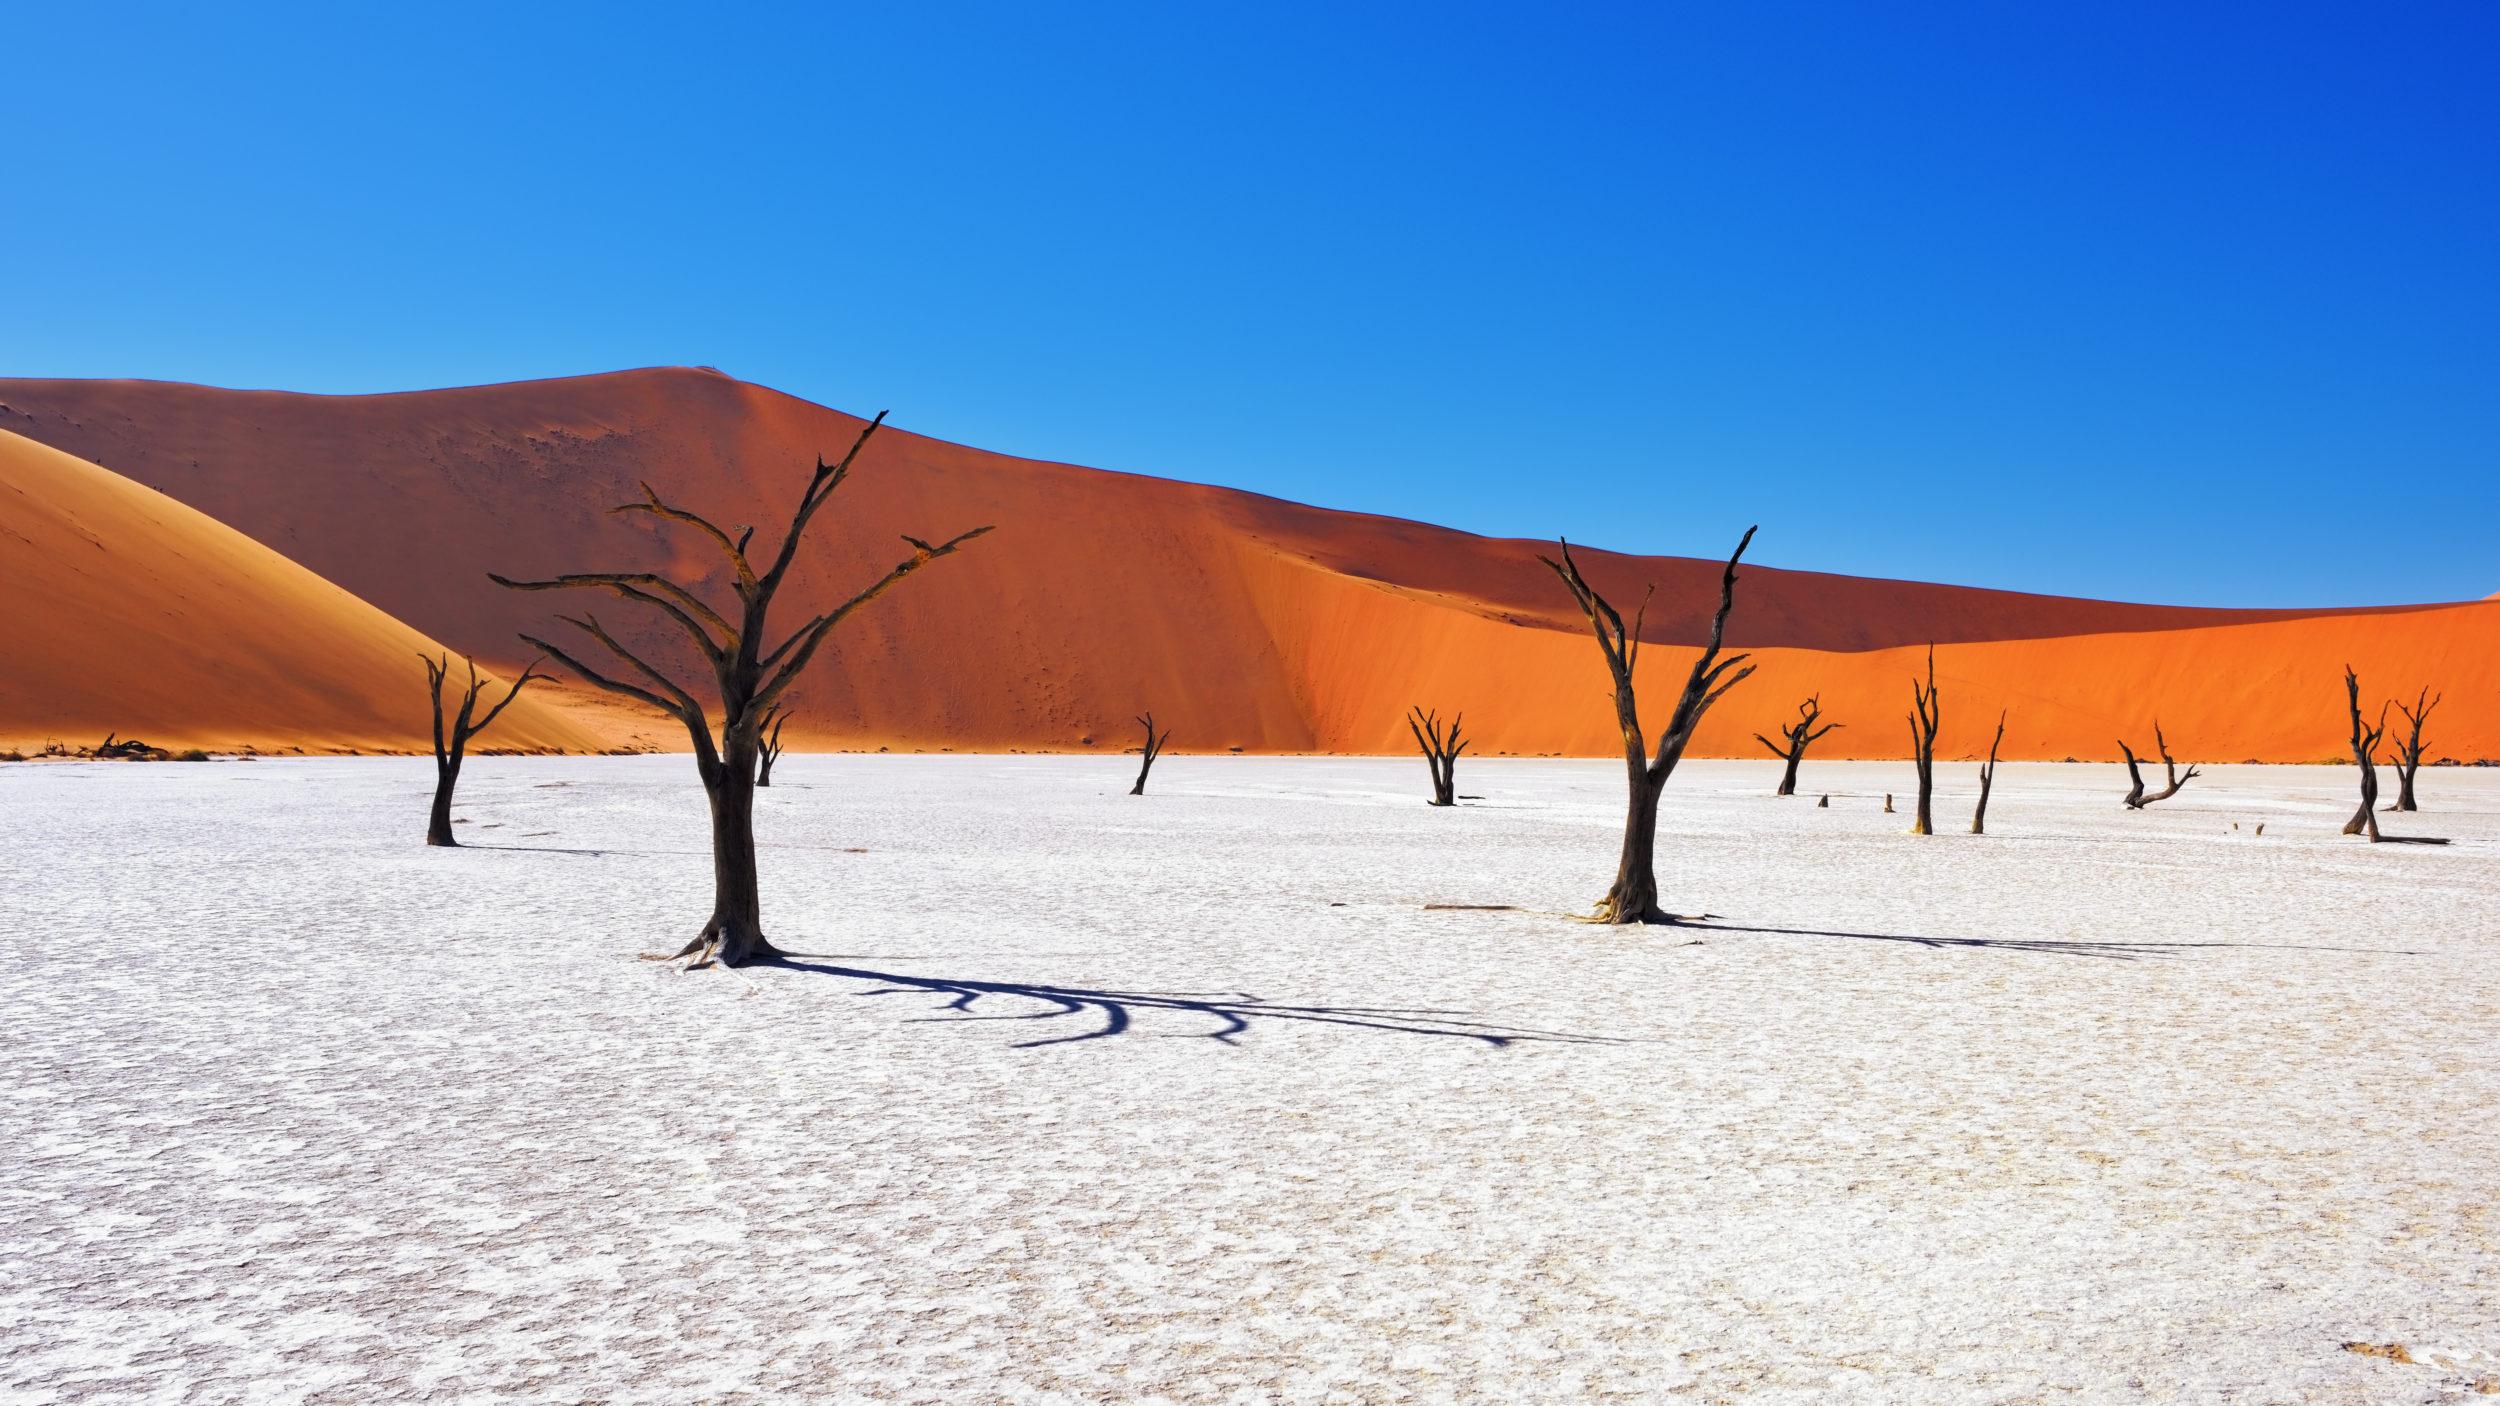 Namibia [shutterstock]